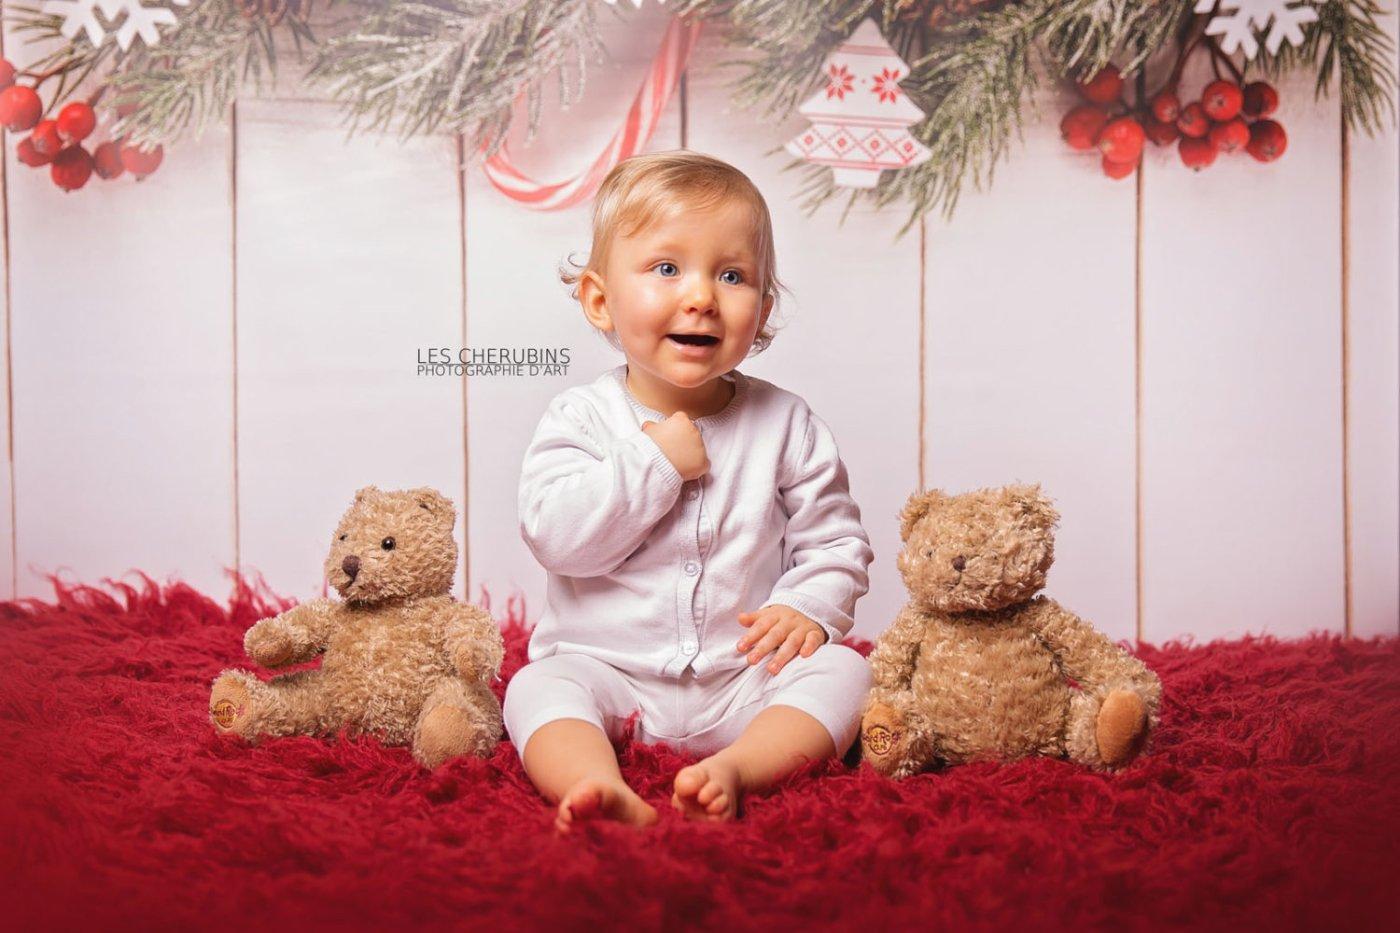 Cherubins-Photographie-Photo-Photographe-Femme-Enceinte-Nouveau-Ne-Maternite-Grossesse-Famille-Bebe-Enfant-Toulon-Marseille-Monaco-Nice-Var-Noel5